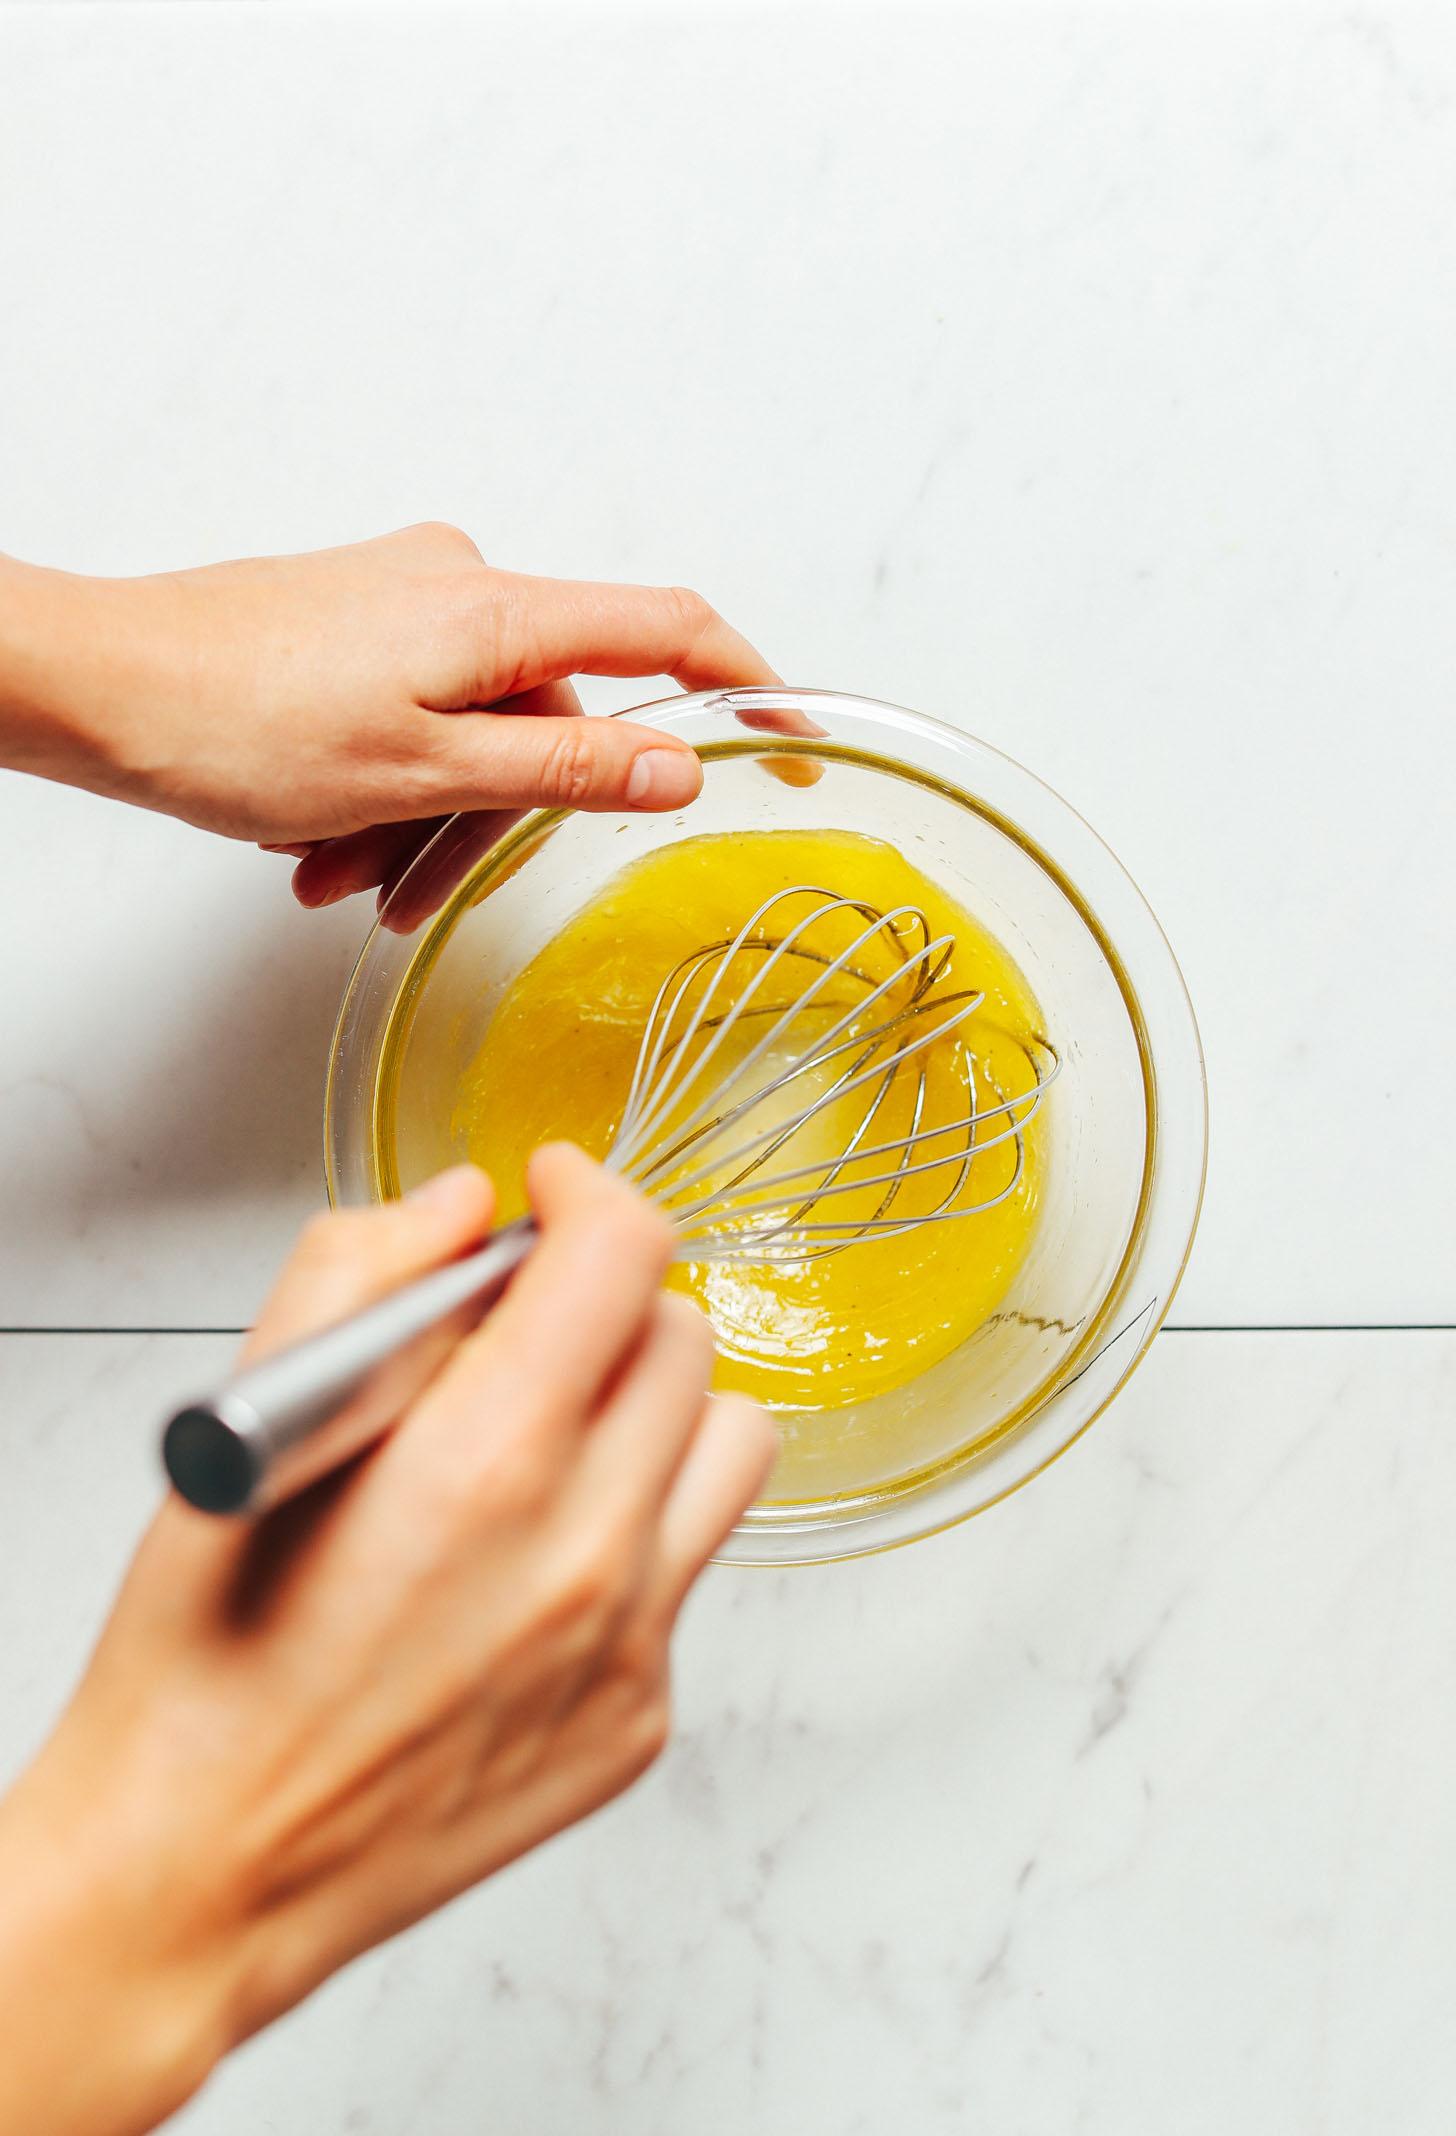 Using a whisk to stir together ingredients for homemade Lemon Vinaigrette